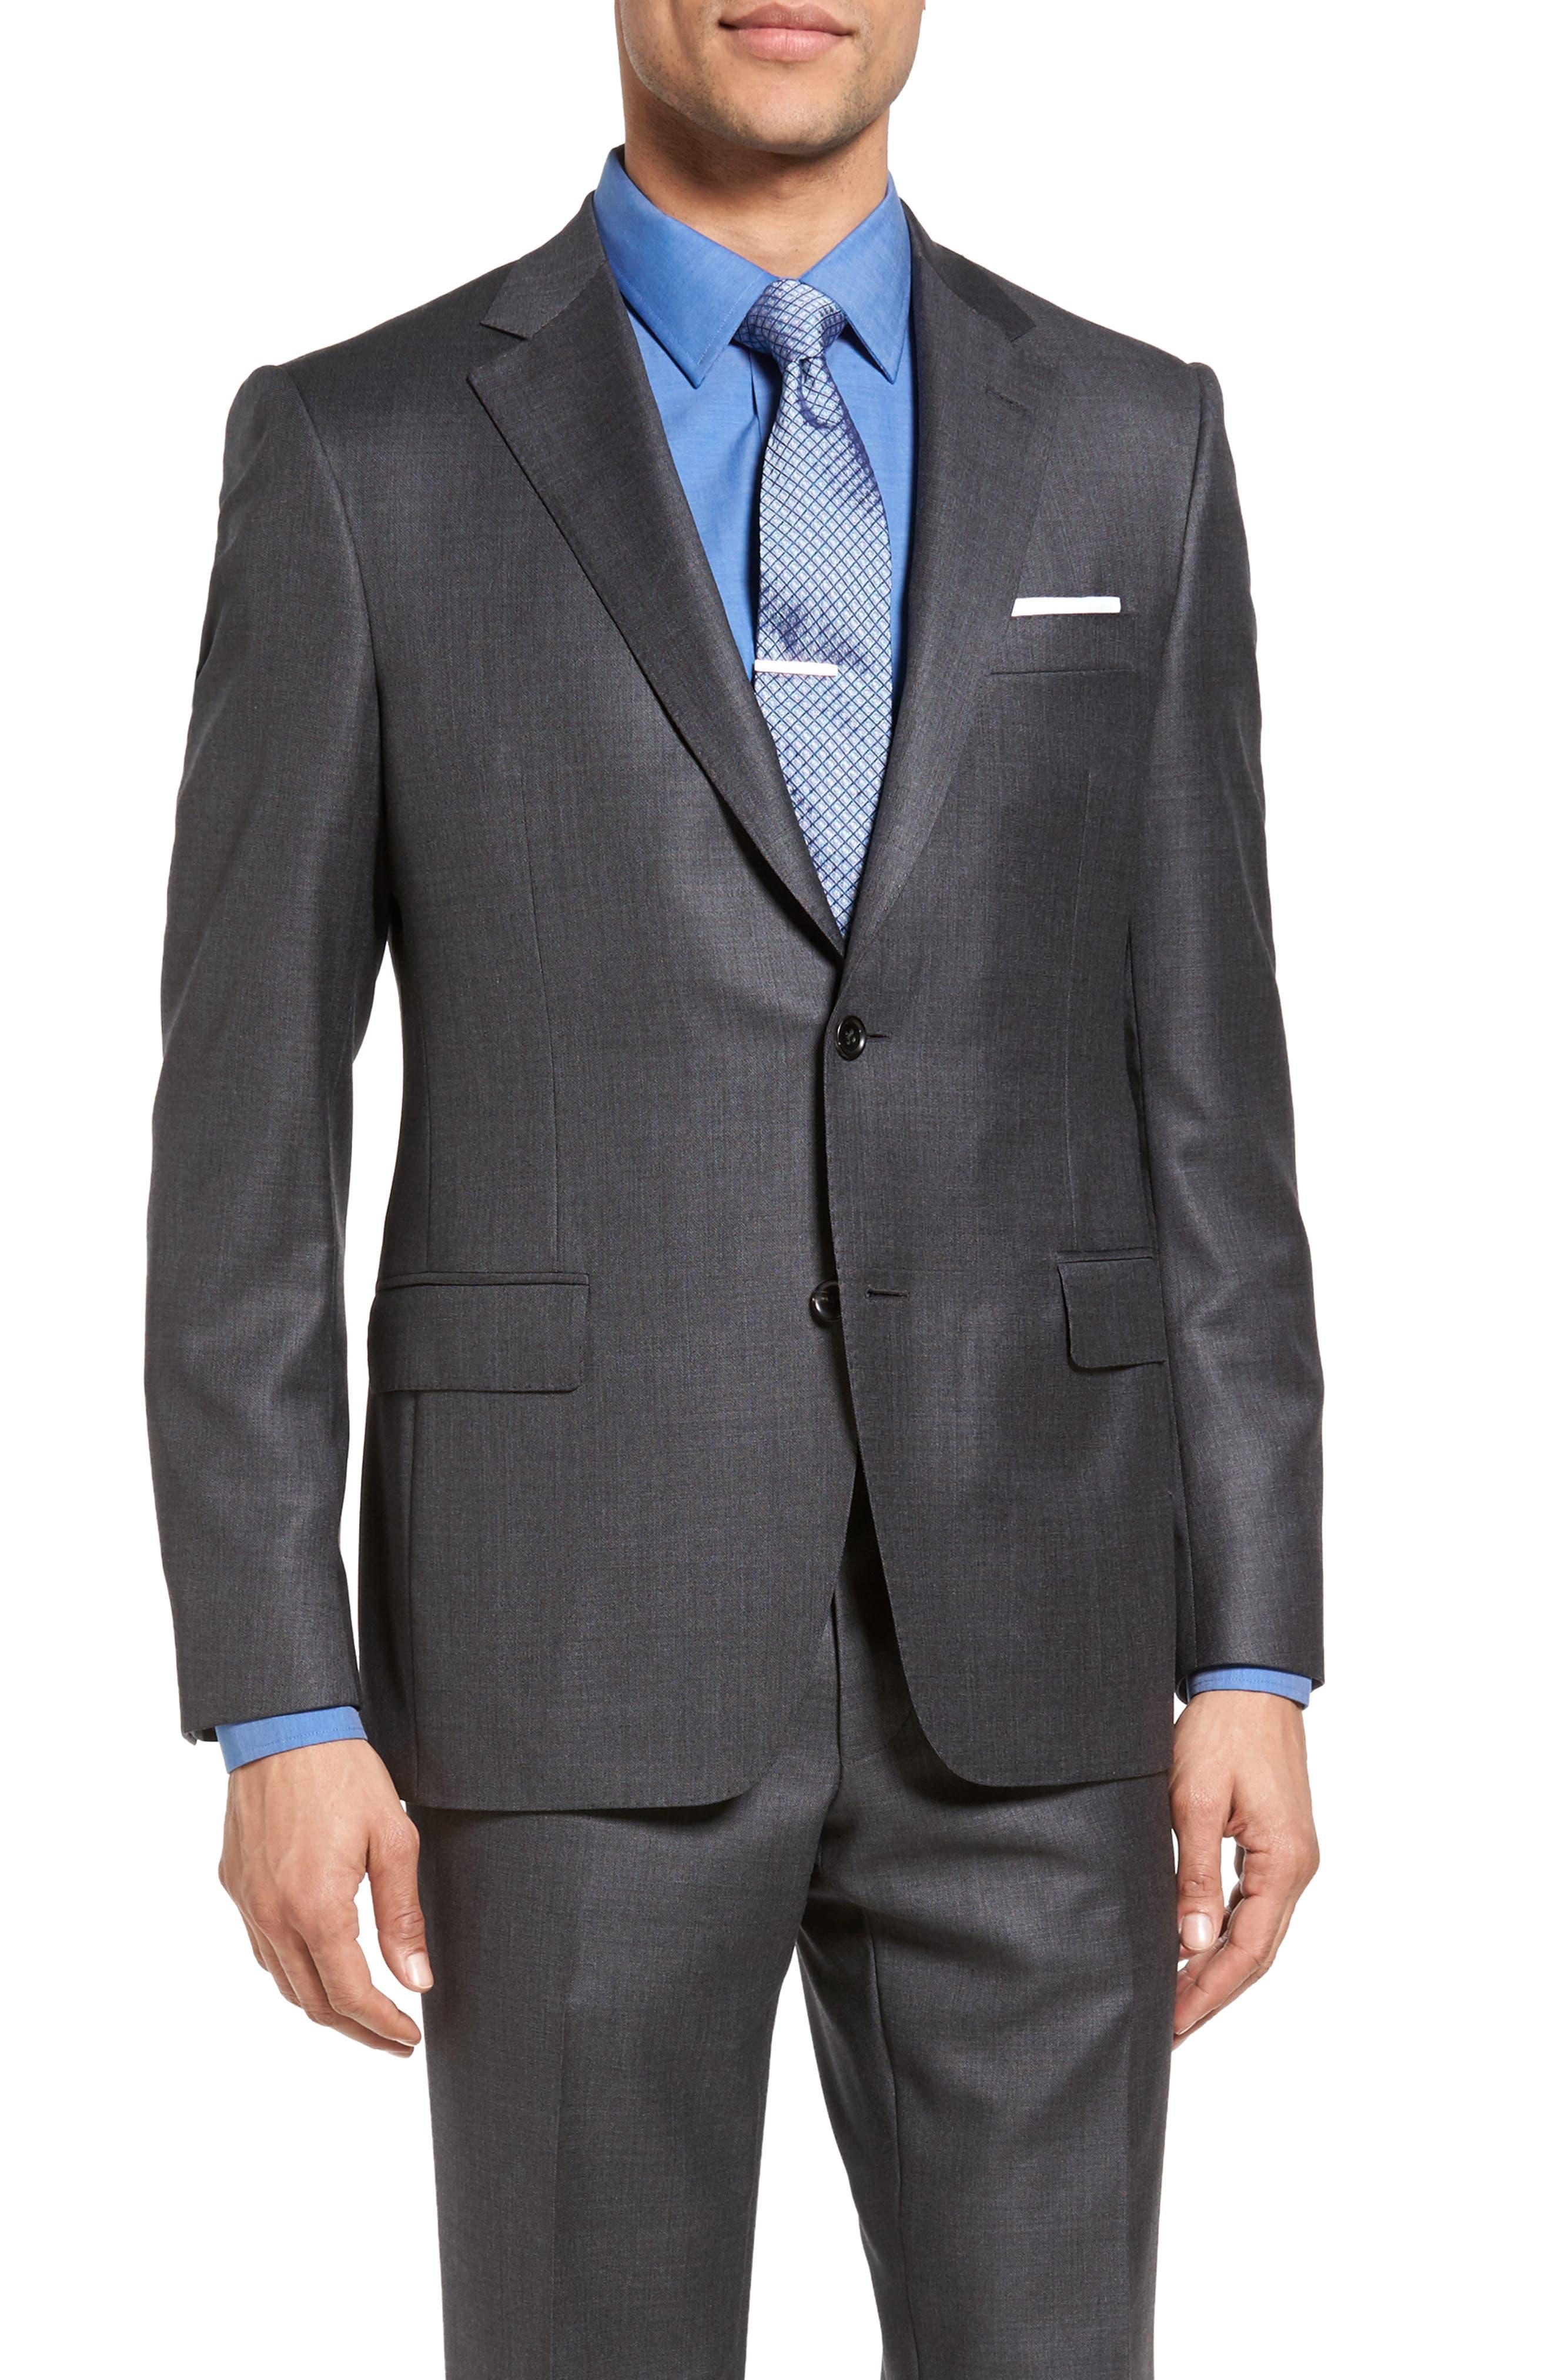 SAMUELSOHN,                             Beckett Classic Fit Sharkskin Wool Suit,                             Alternate thumbnail 5, color,                             020